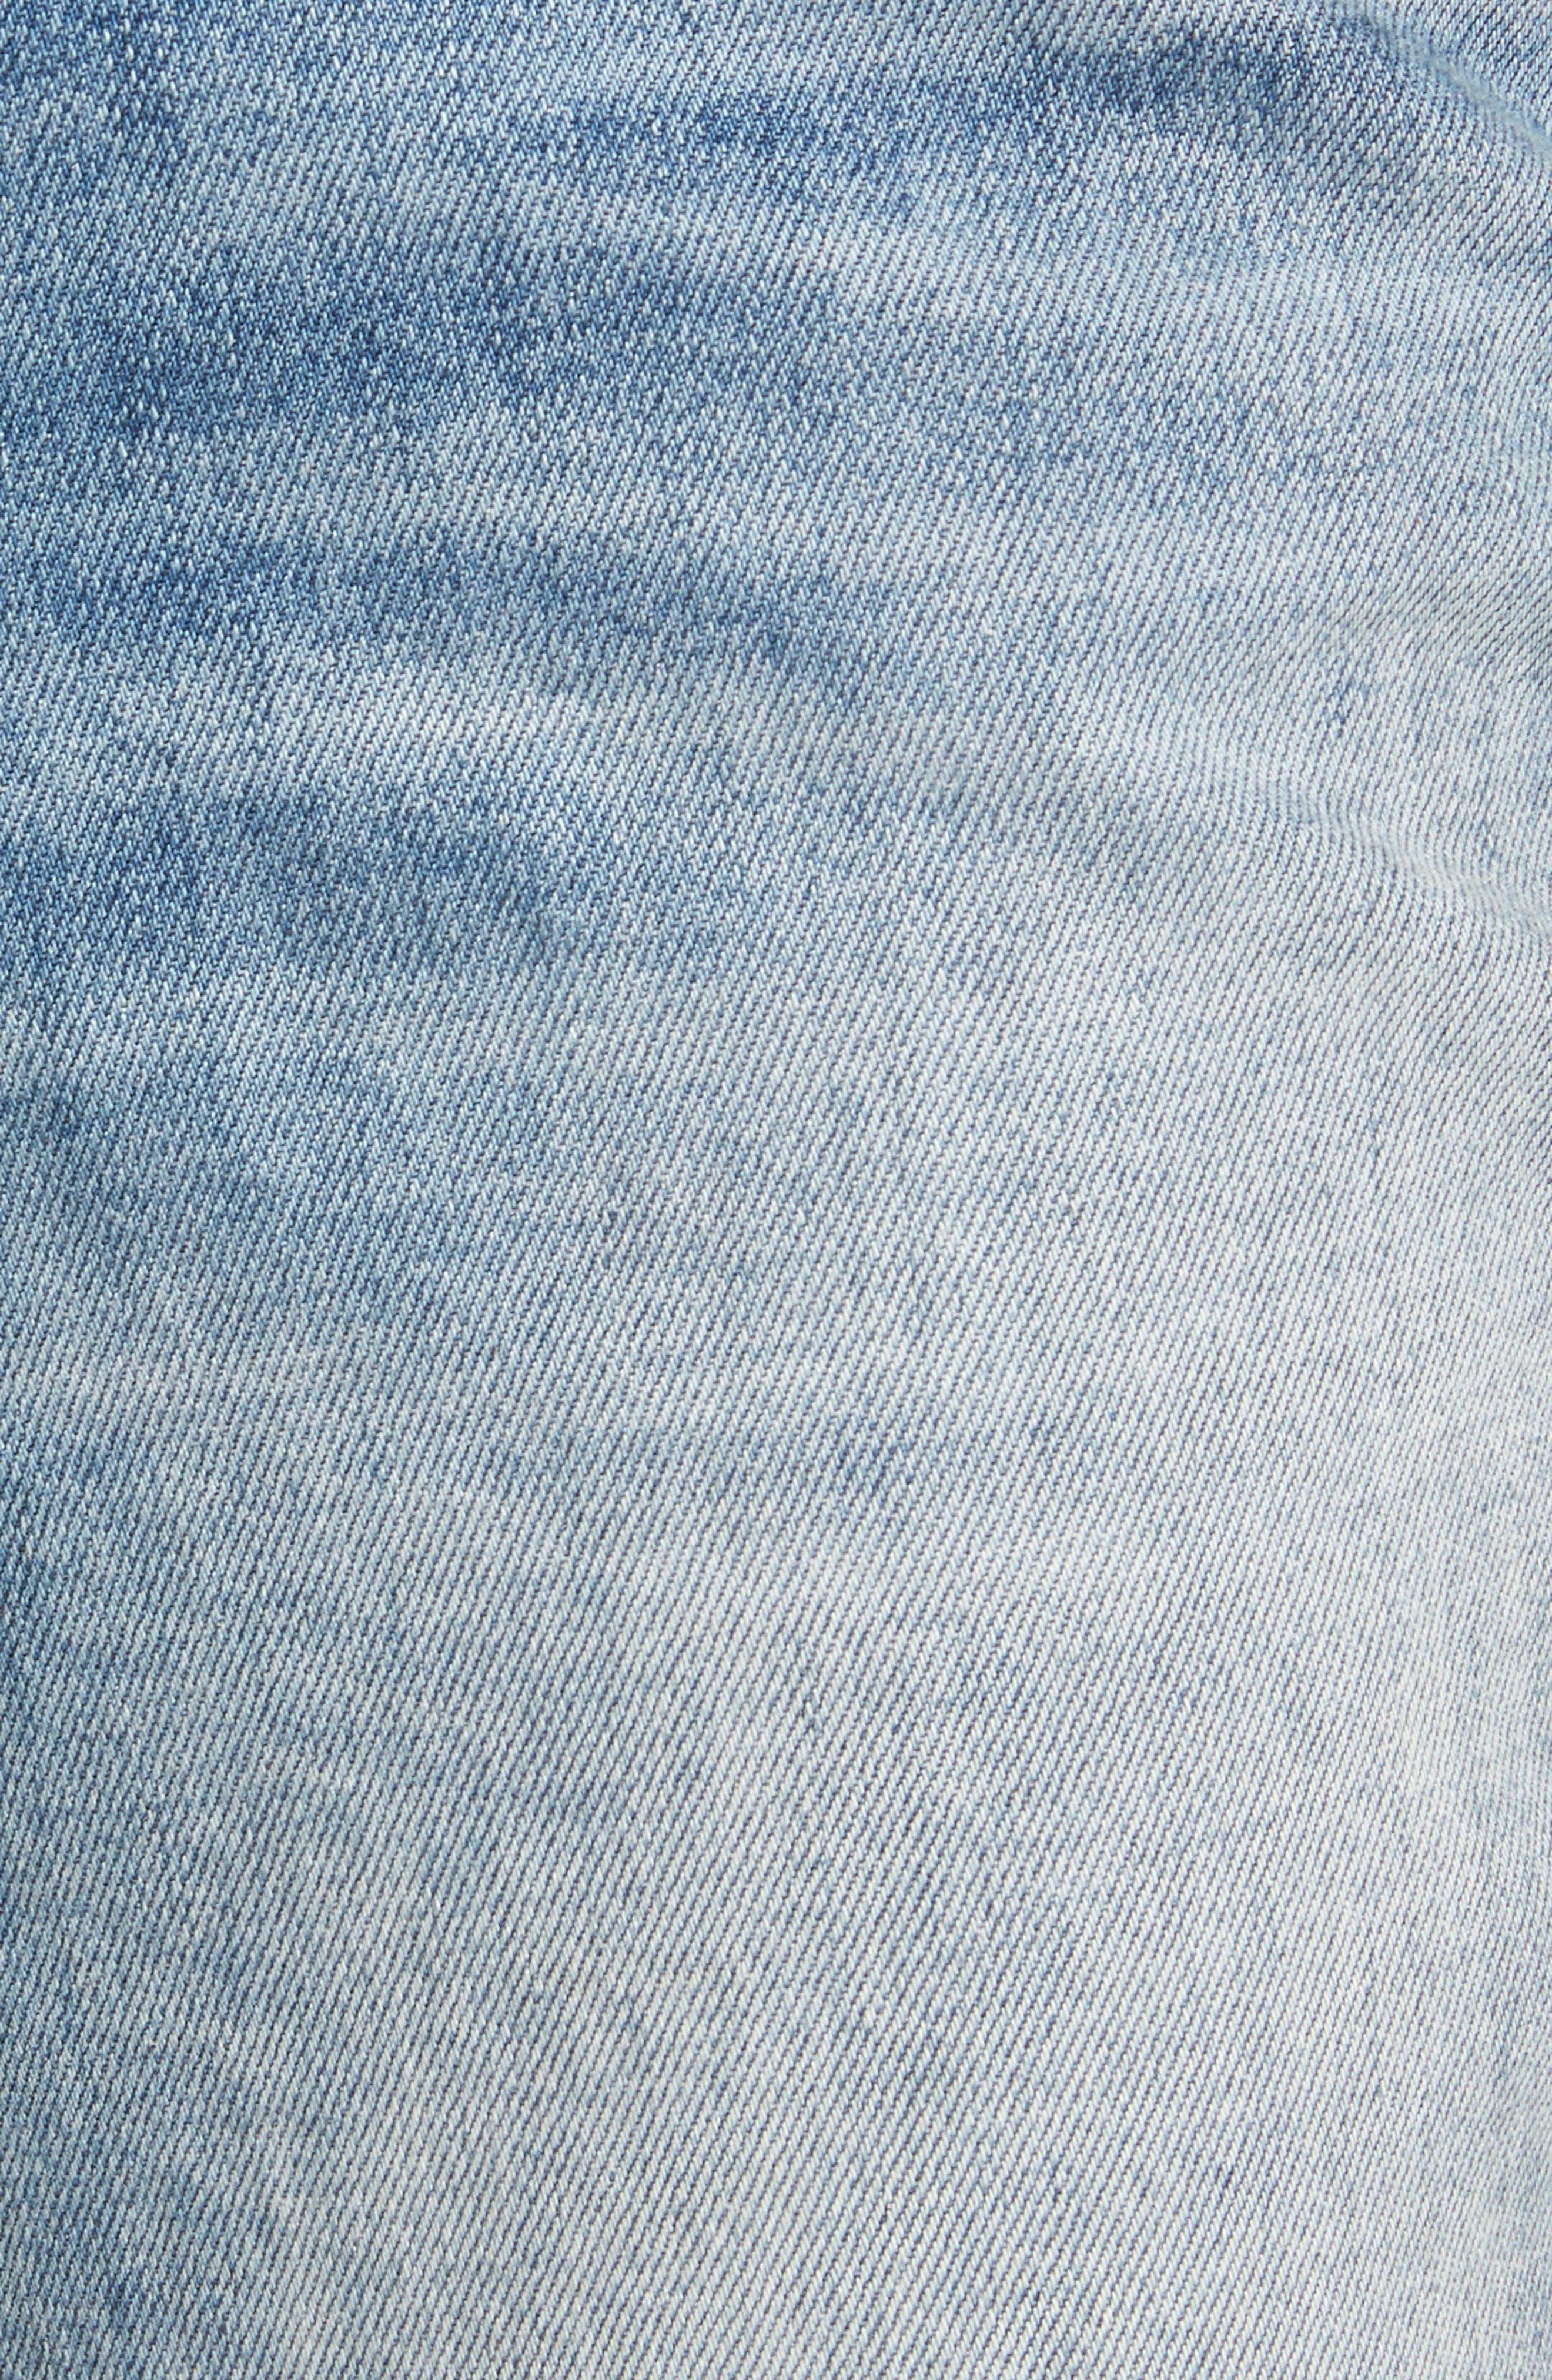 Loose Fit Slim Jeans,                             Alternate thumbnail 5, color,                             Gravel Light Destroy